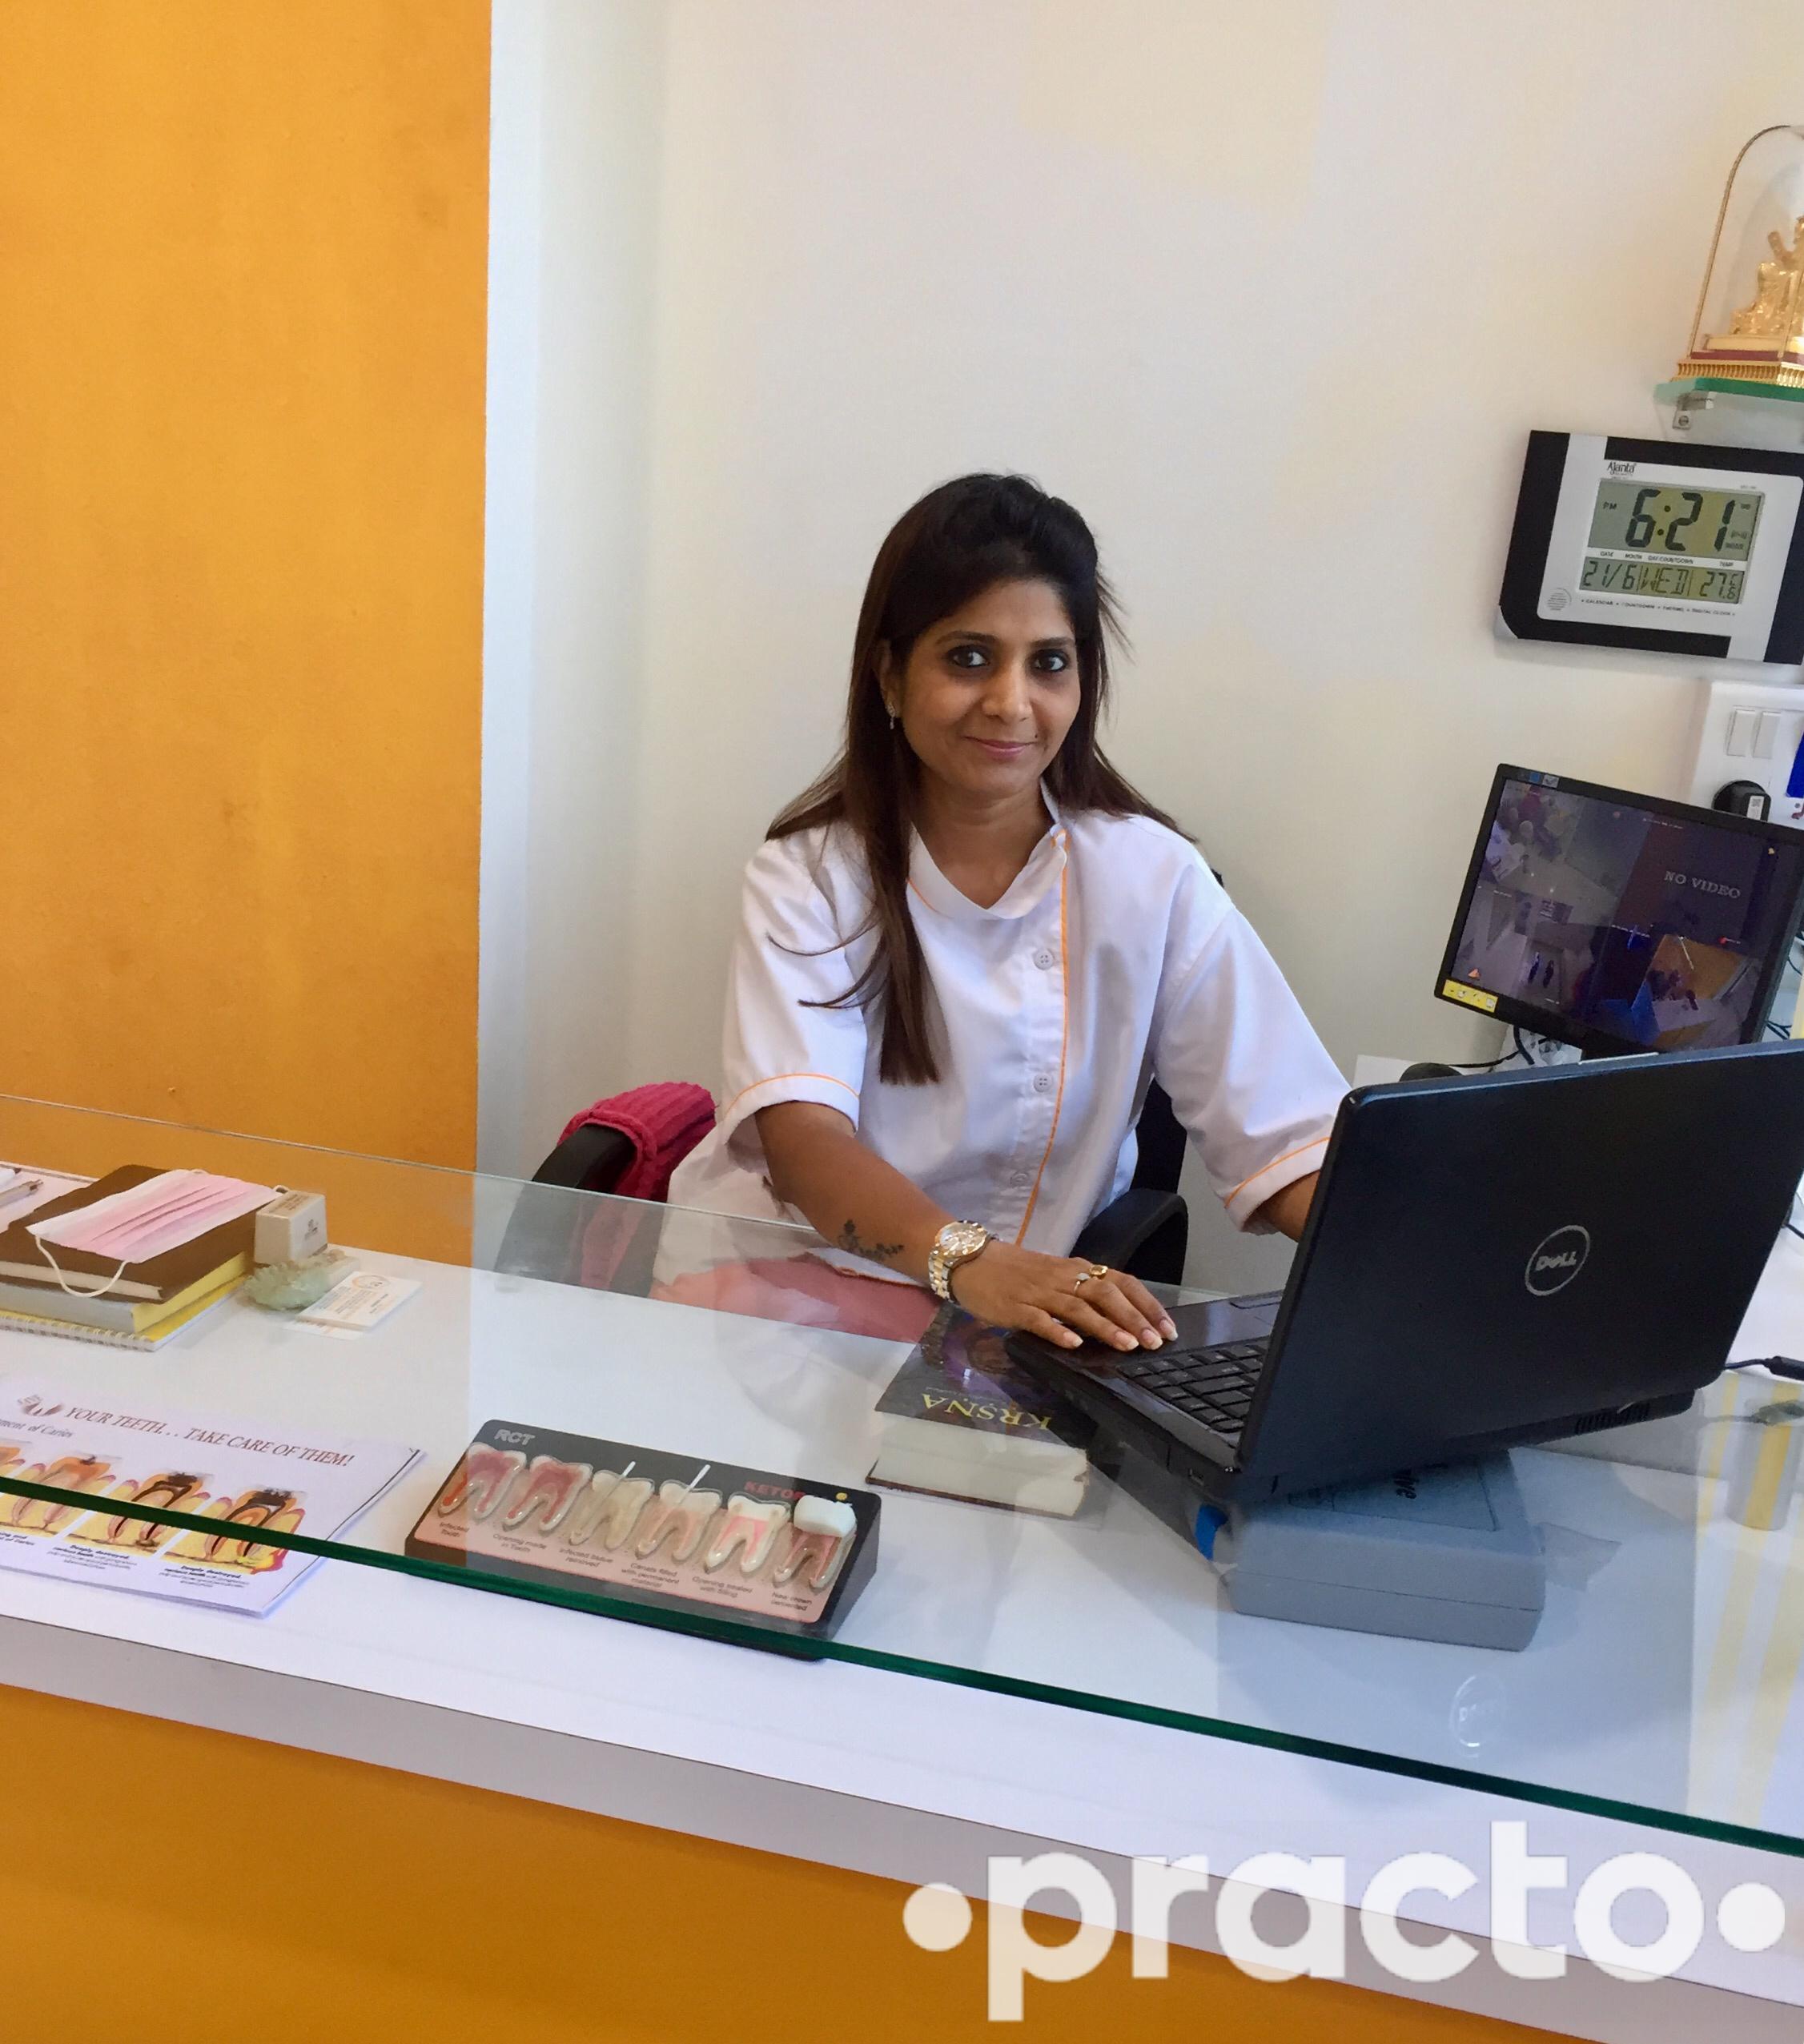 Dr. Pratibha Bhosale - Dentist